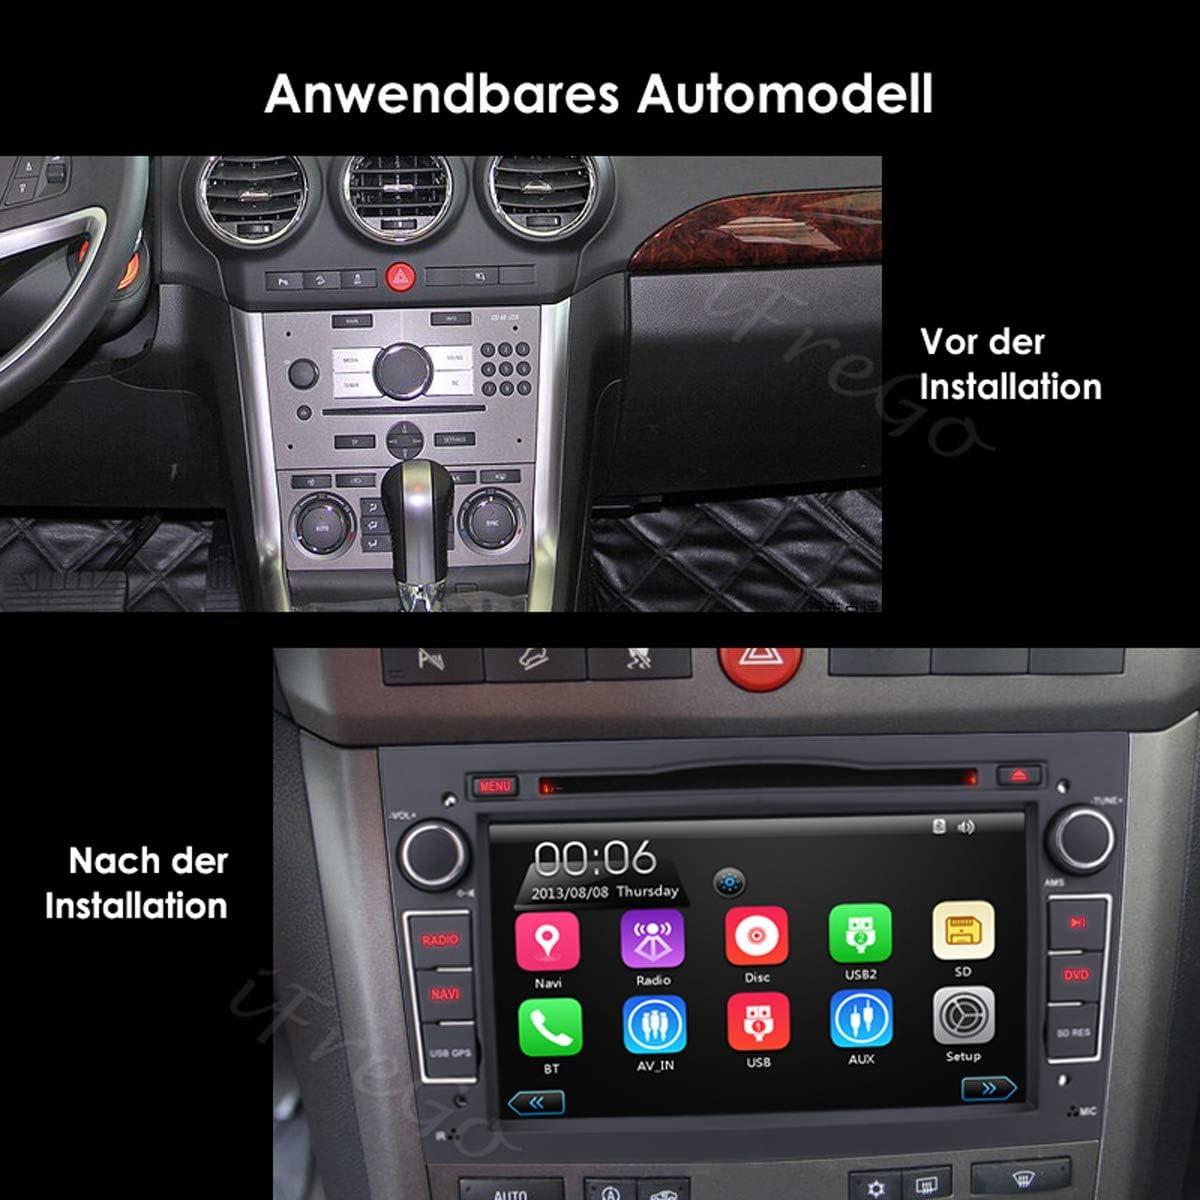 Ifrego Autoradio Für Opel Antara Astra Combo Corsa Meriva Vectra Zafira Vivaro 7 Zoll 2 Din Touchscreen Radio Autoradio Bluetooth Gps Navigation Autoradio Dvd Cd Windows Ce Autoradio Dab Schwarz Navigation